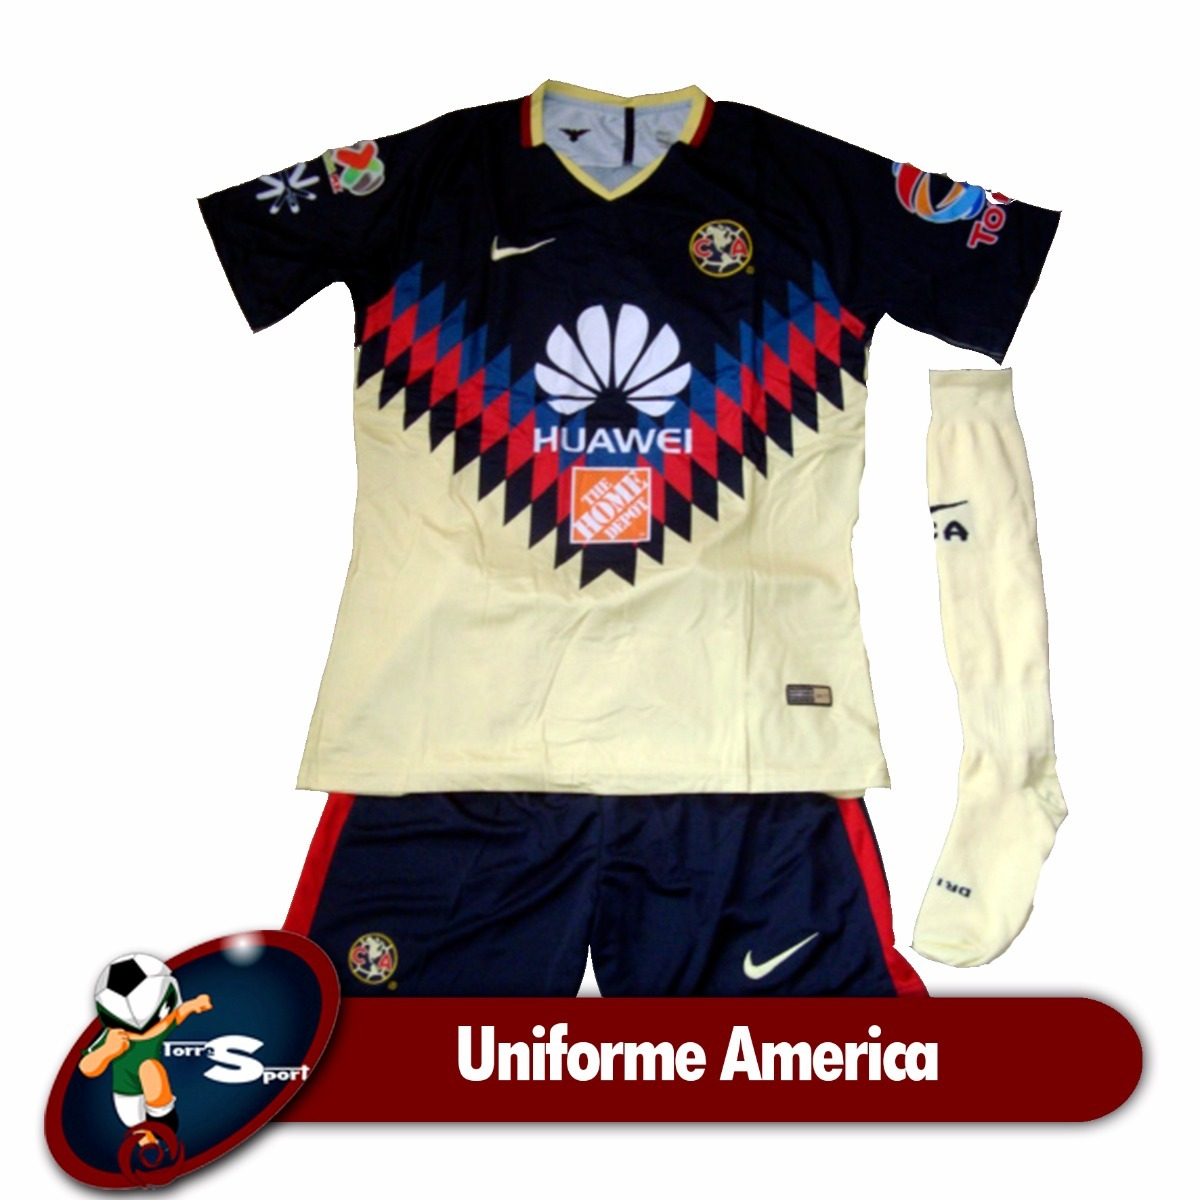 Uniformes De Futbol Originales Liga Mx Clubes 2017 2018